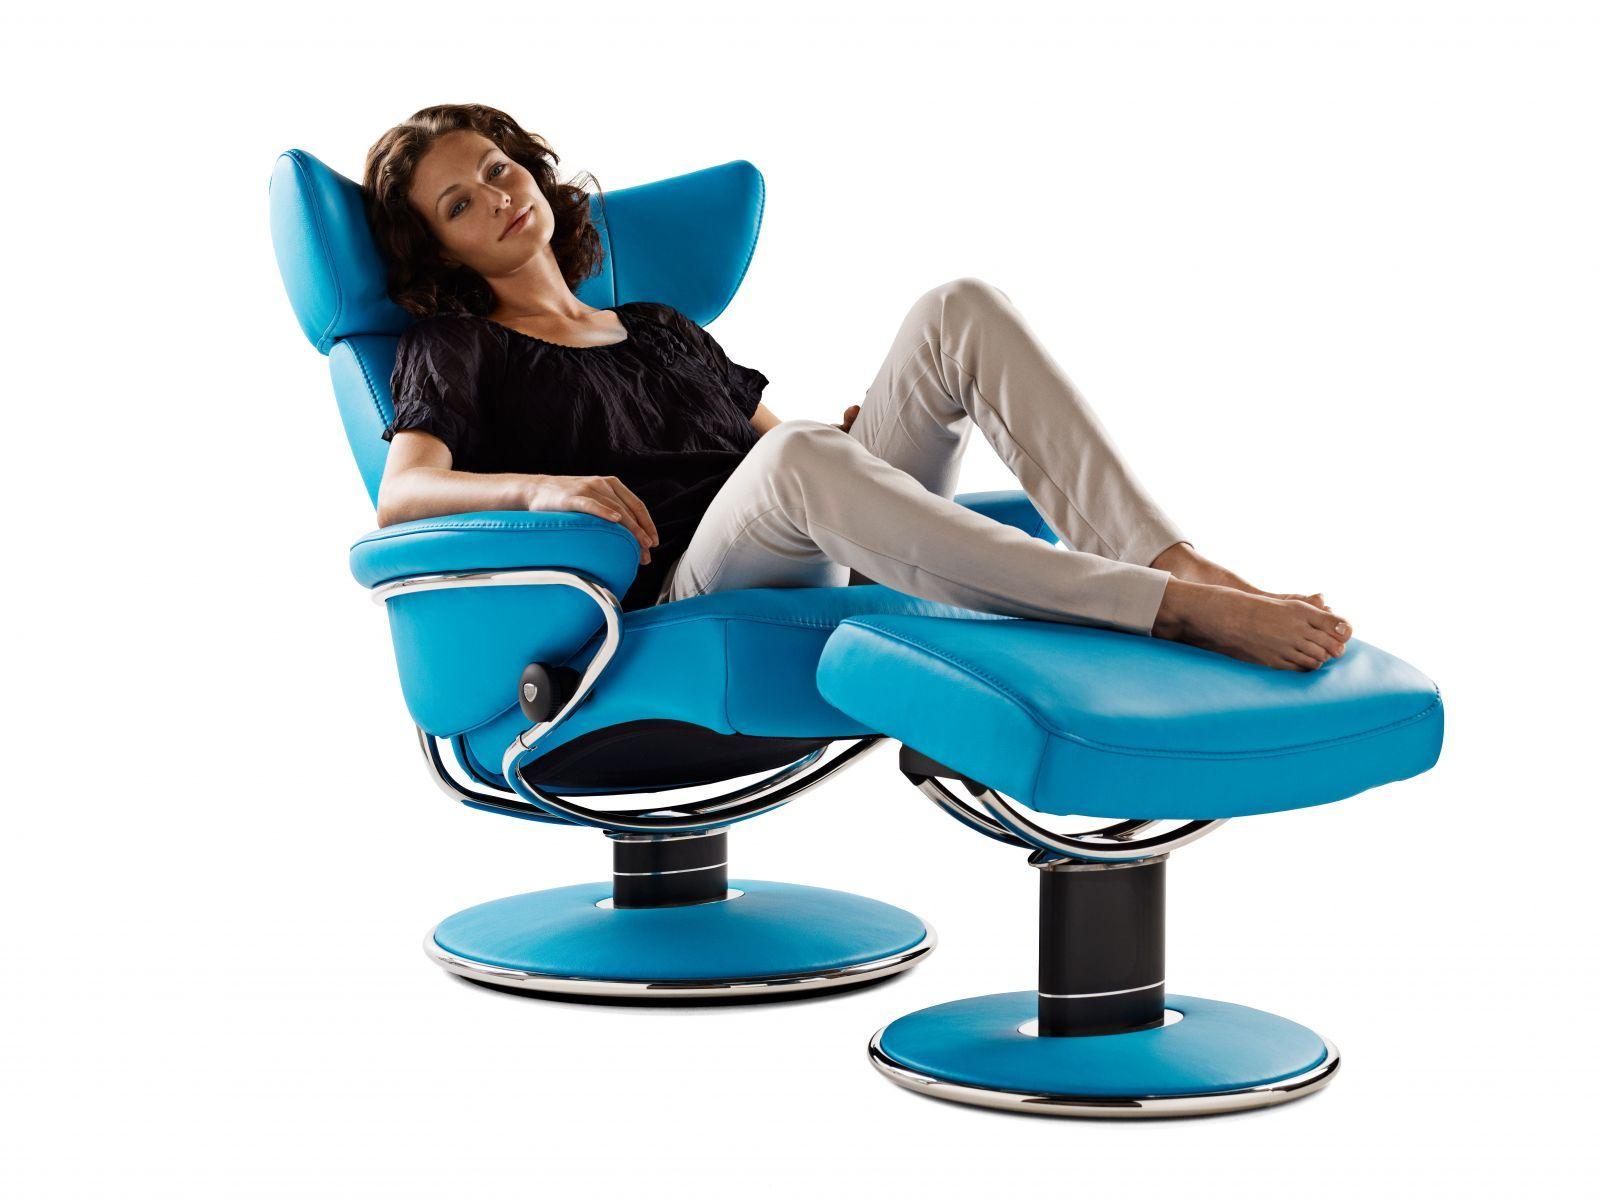 stressless chair similar fishing backpack by ekornes and sofa showroom orange